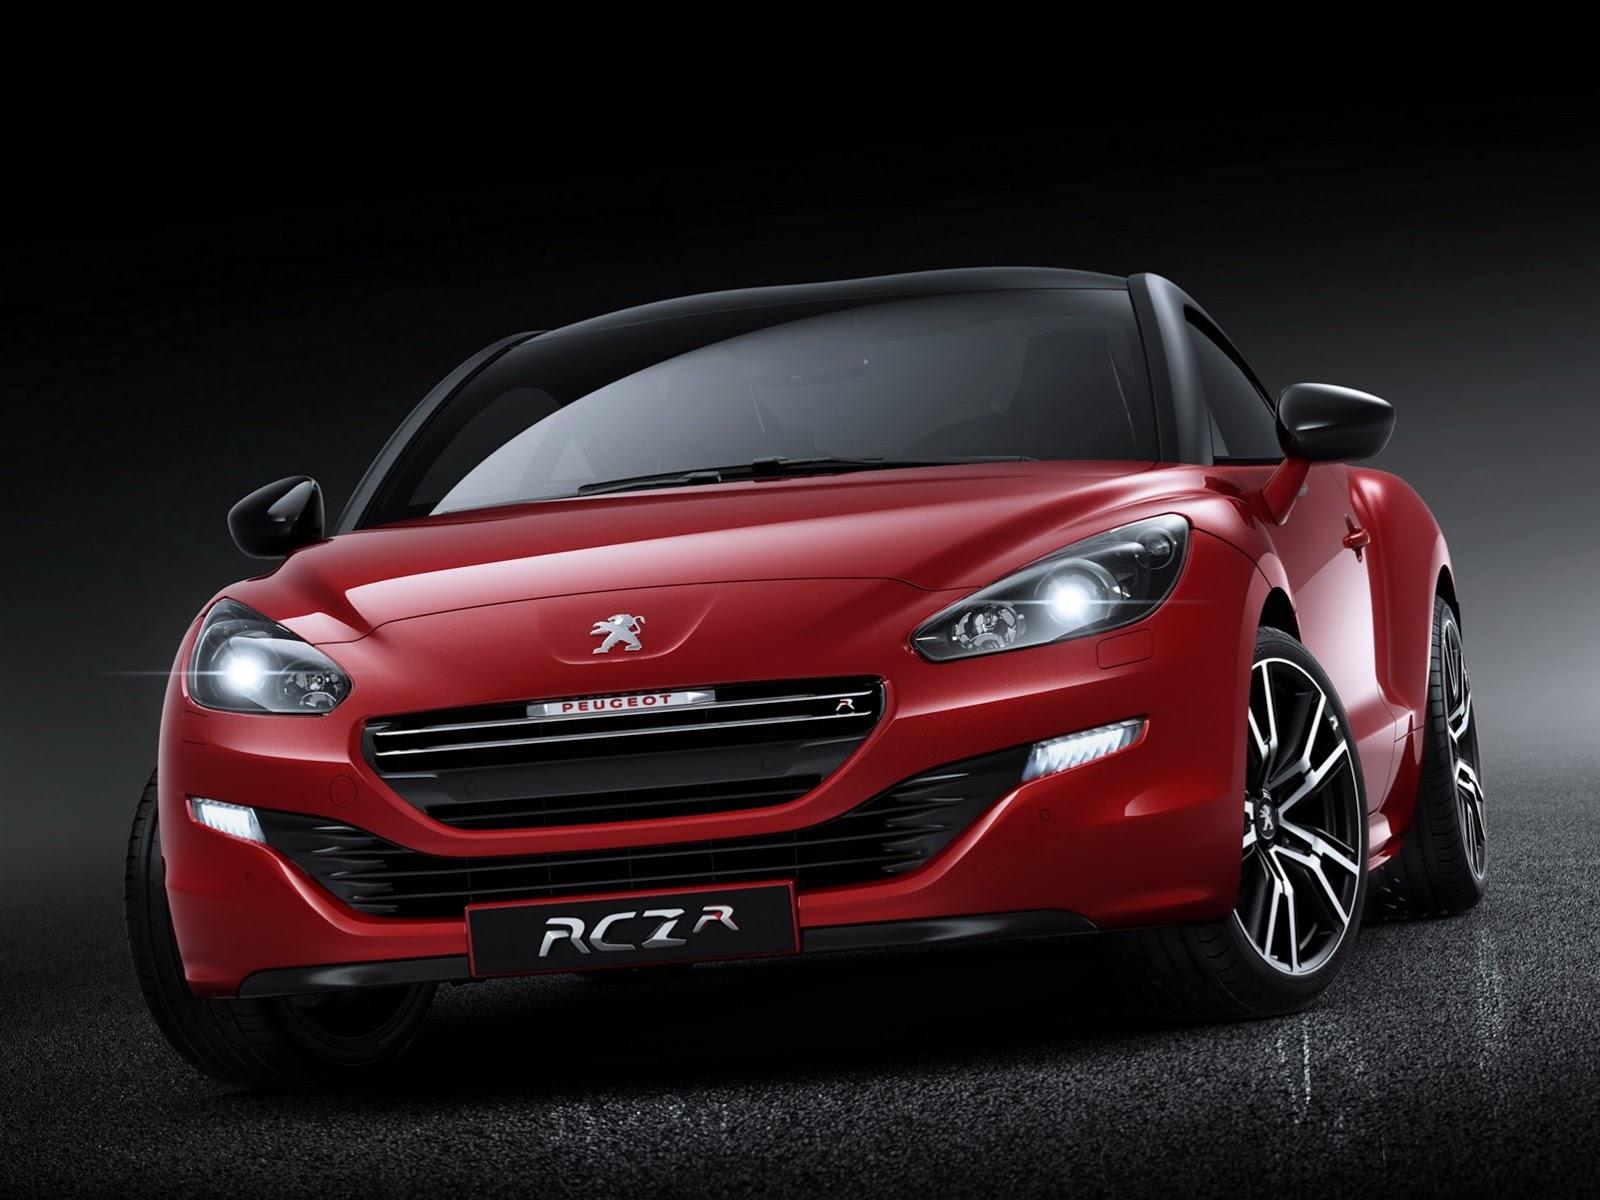 2014-Peugeot-RCZ-R-1%25255B4%25255D.jpg